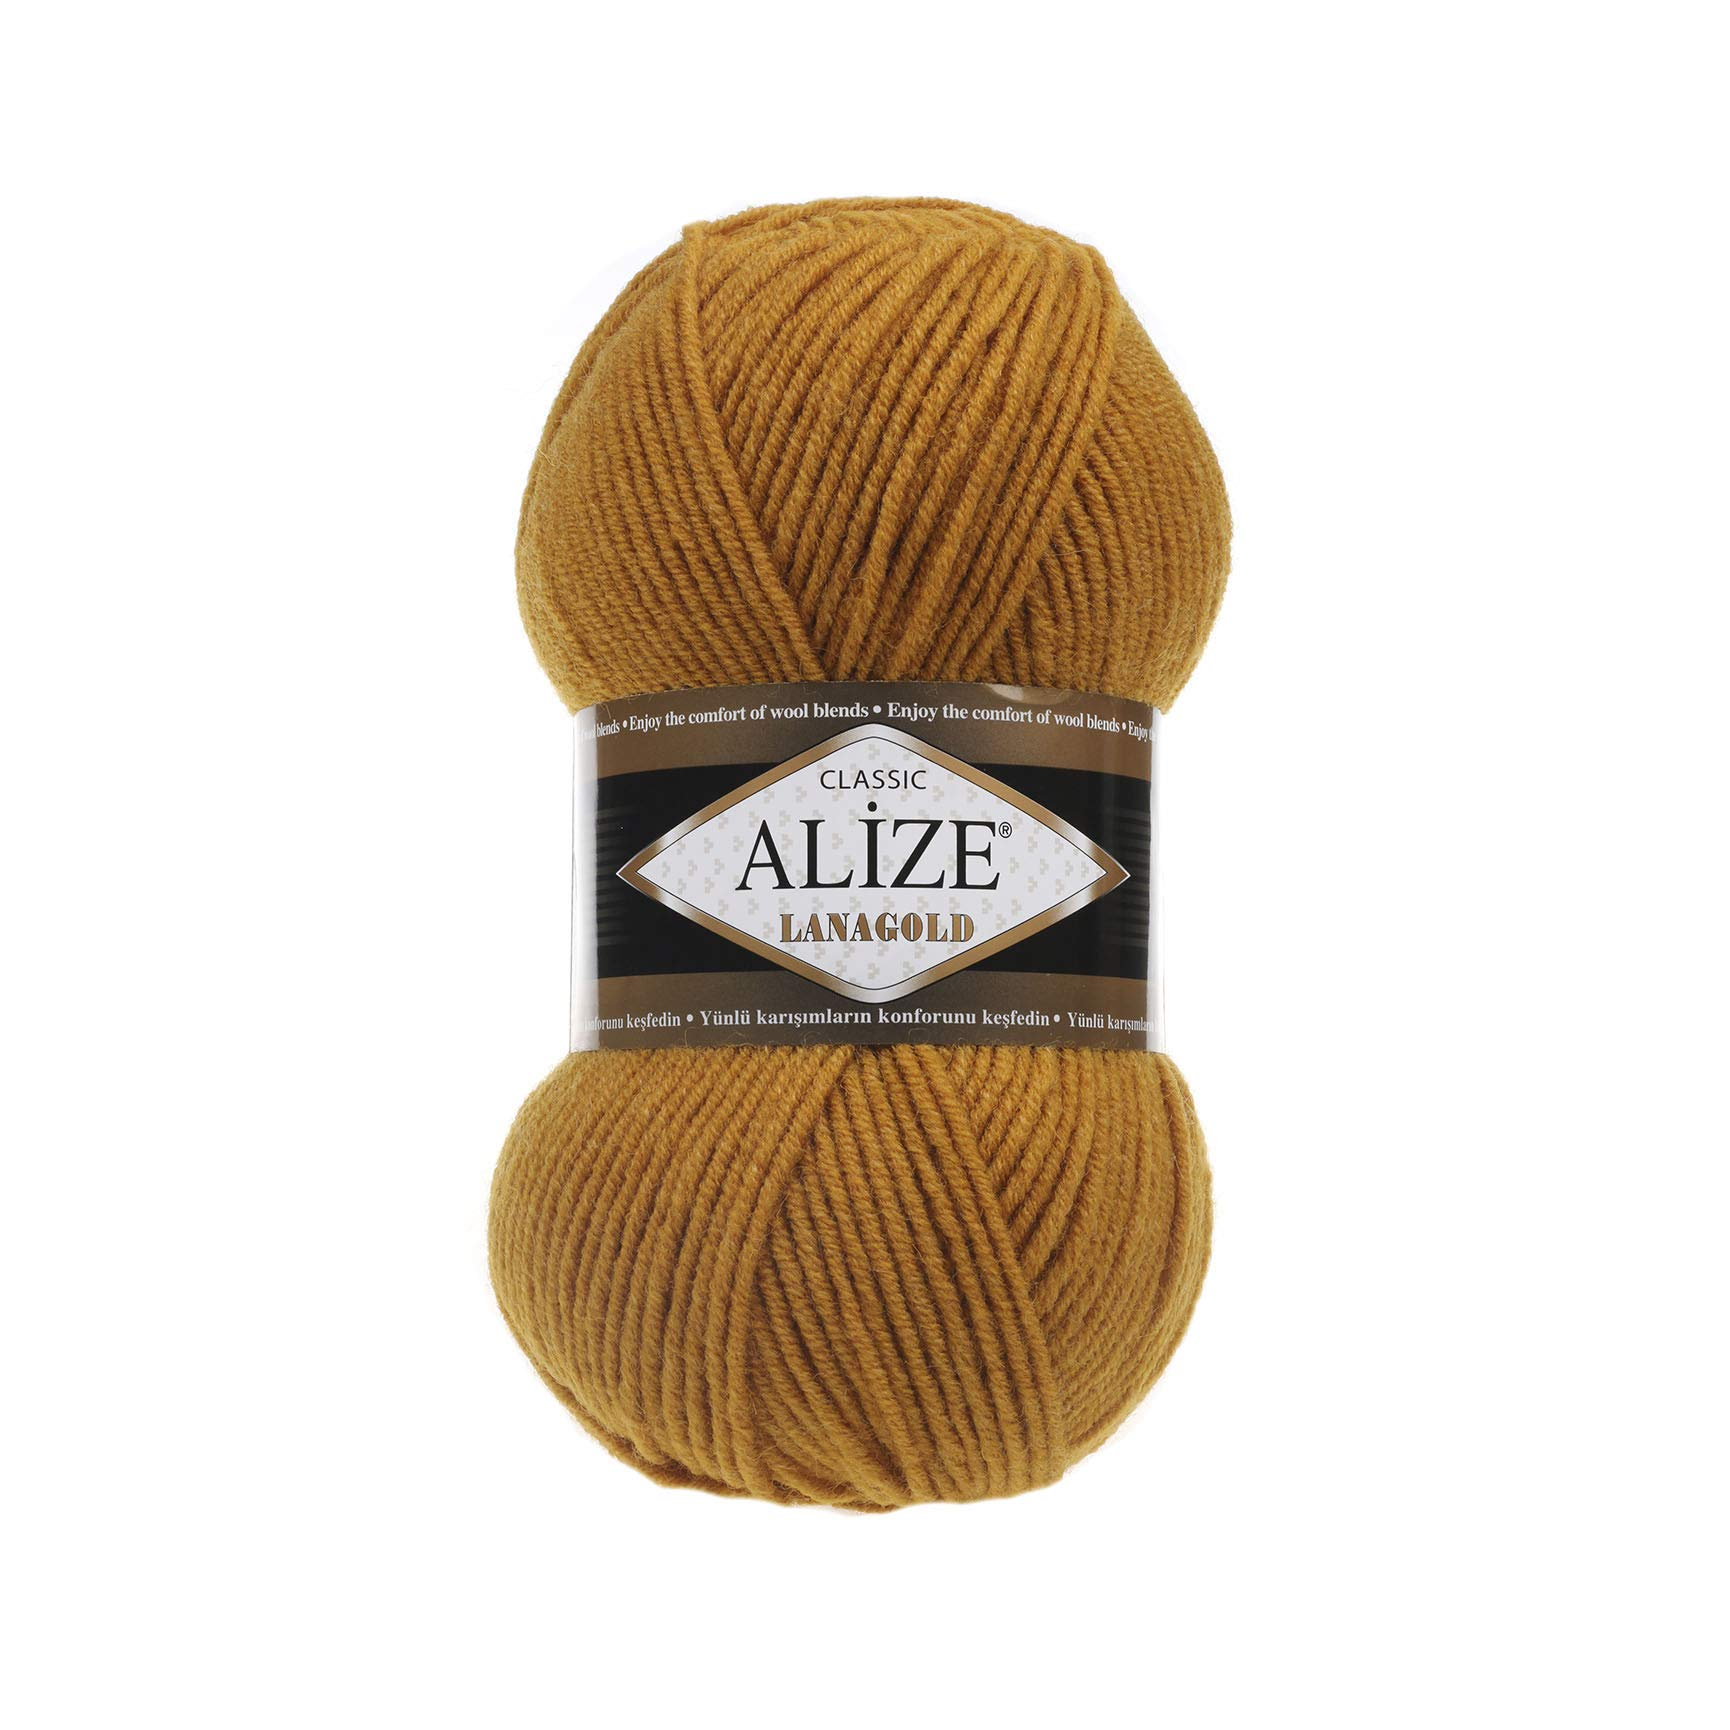 Hand Knitting Yarn Alize LanaGold Yarn for Crochet Knitting & Crafting Wool Blend Warm Soft Natural Chunky Hand Woven Knitting Crochet Knitwear Wool Lot of 4 skn 400gr 1048yds Color 645 Mustard